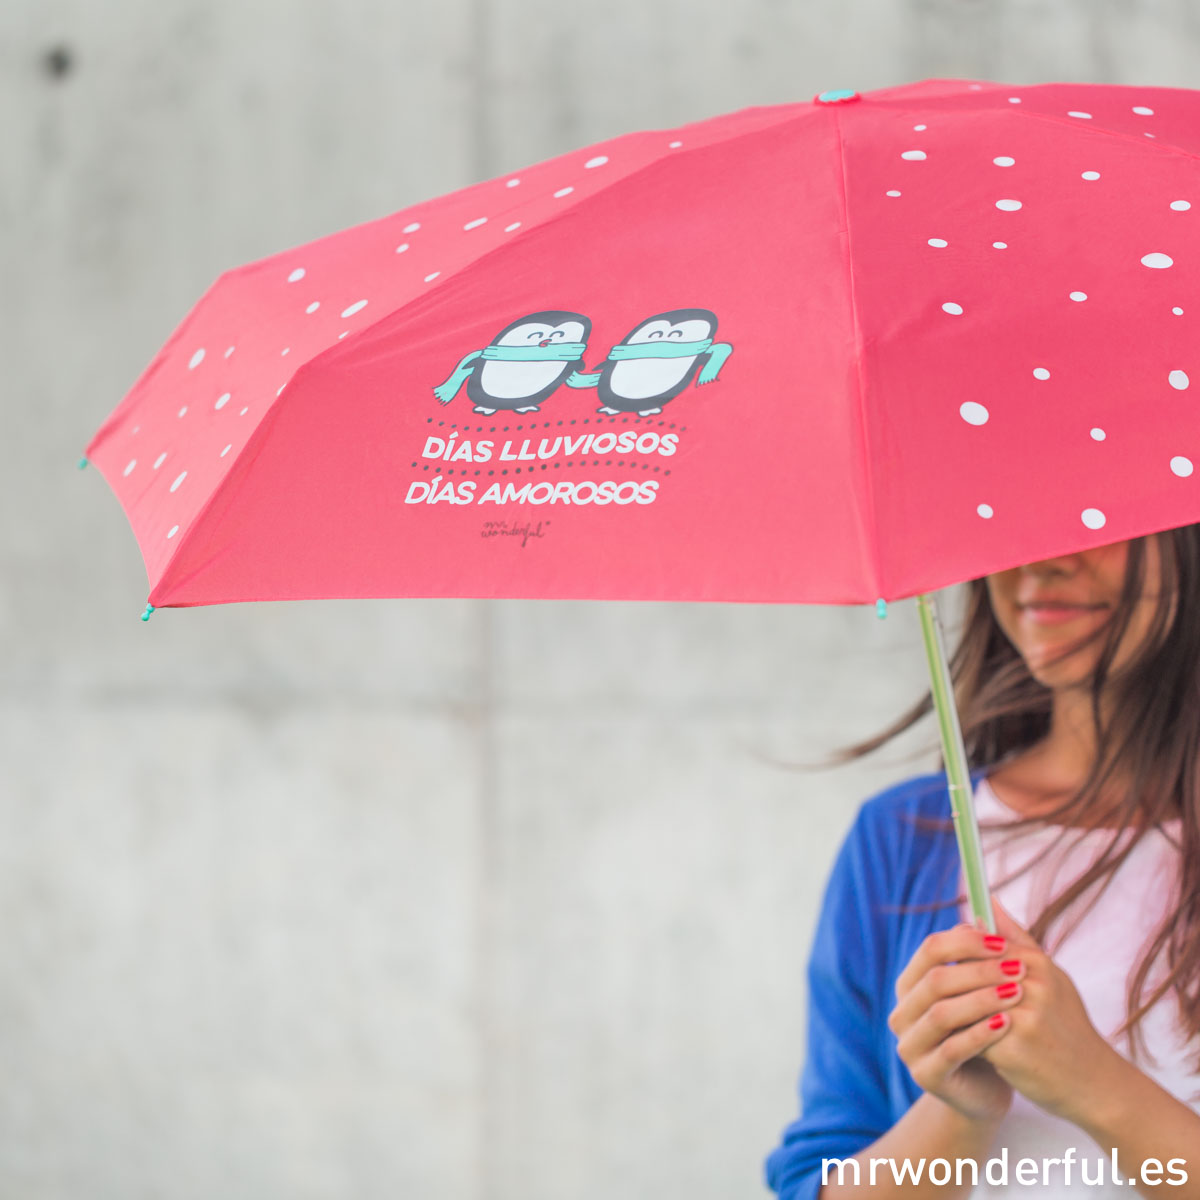 mrwonderful_8436547190089_LLUVIA_AMOROSOS_Paraguas-Pequeno-plegable_Dias-lluviosos-dias-amorosos-200-Editar